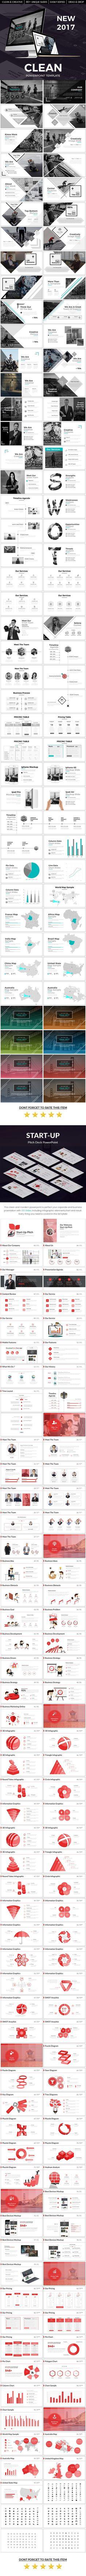 Clean 2017 Powerpoint Presentation Bundle | PowerPoint Templates